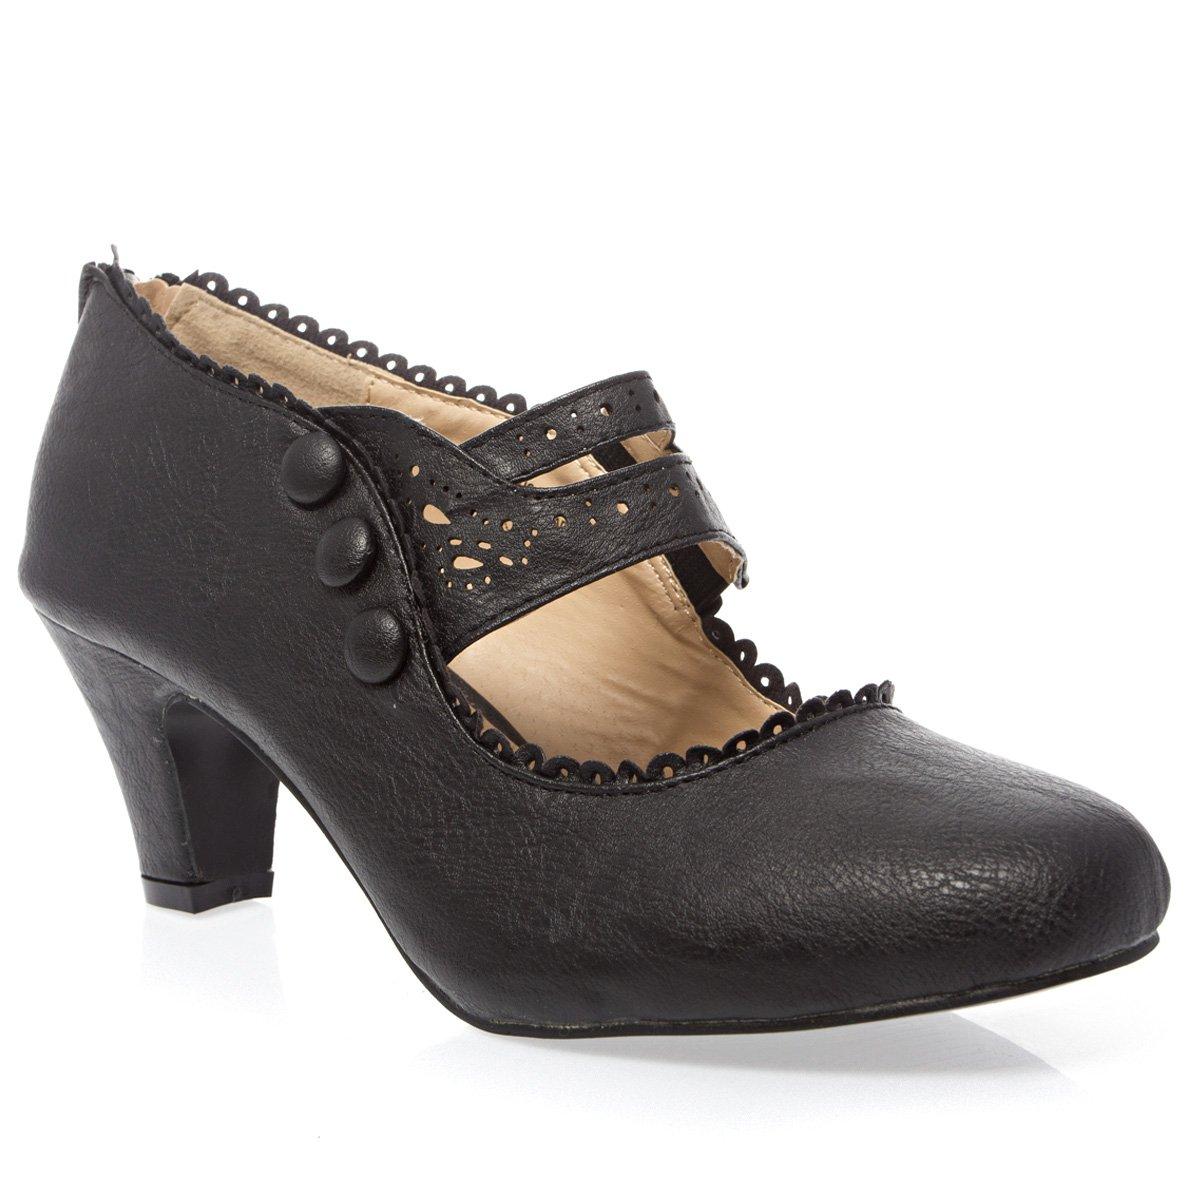 V-Luxury Womens 36-MINA4 Closed Toe Mary Jane High Heel Shoes, Black PU Leather, 10 B (M) US